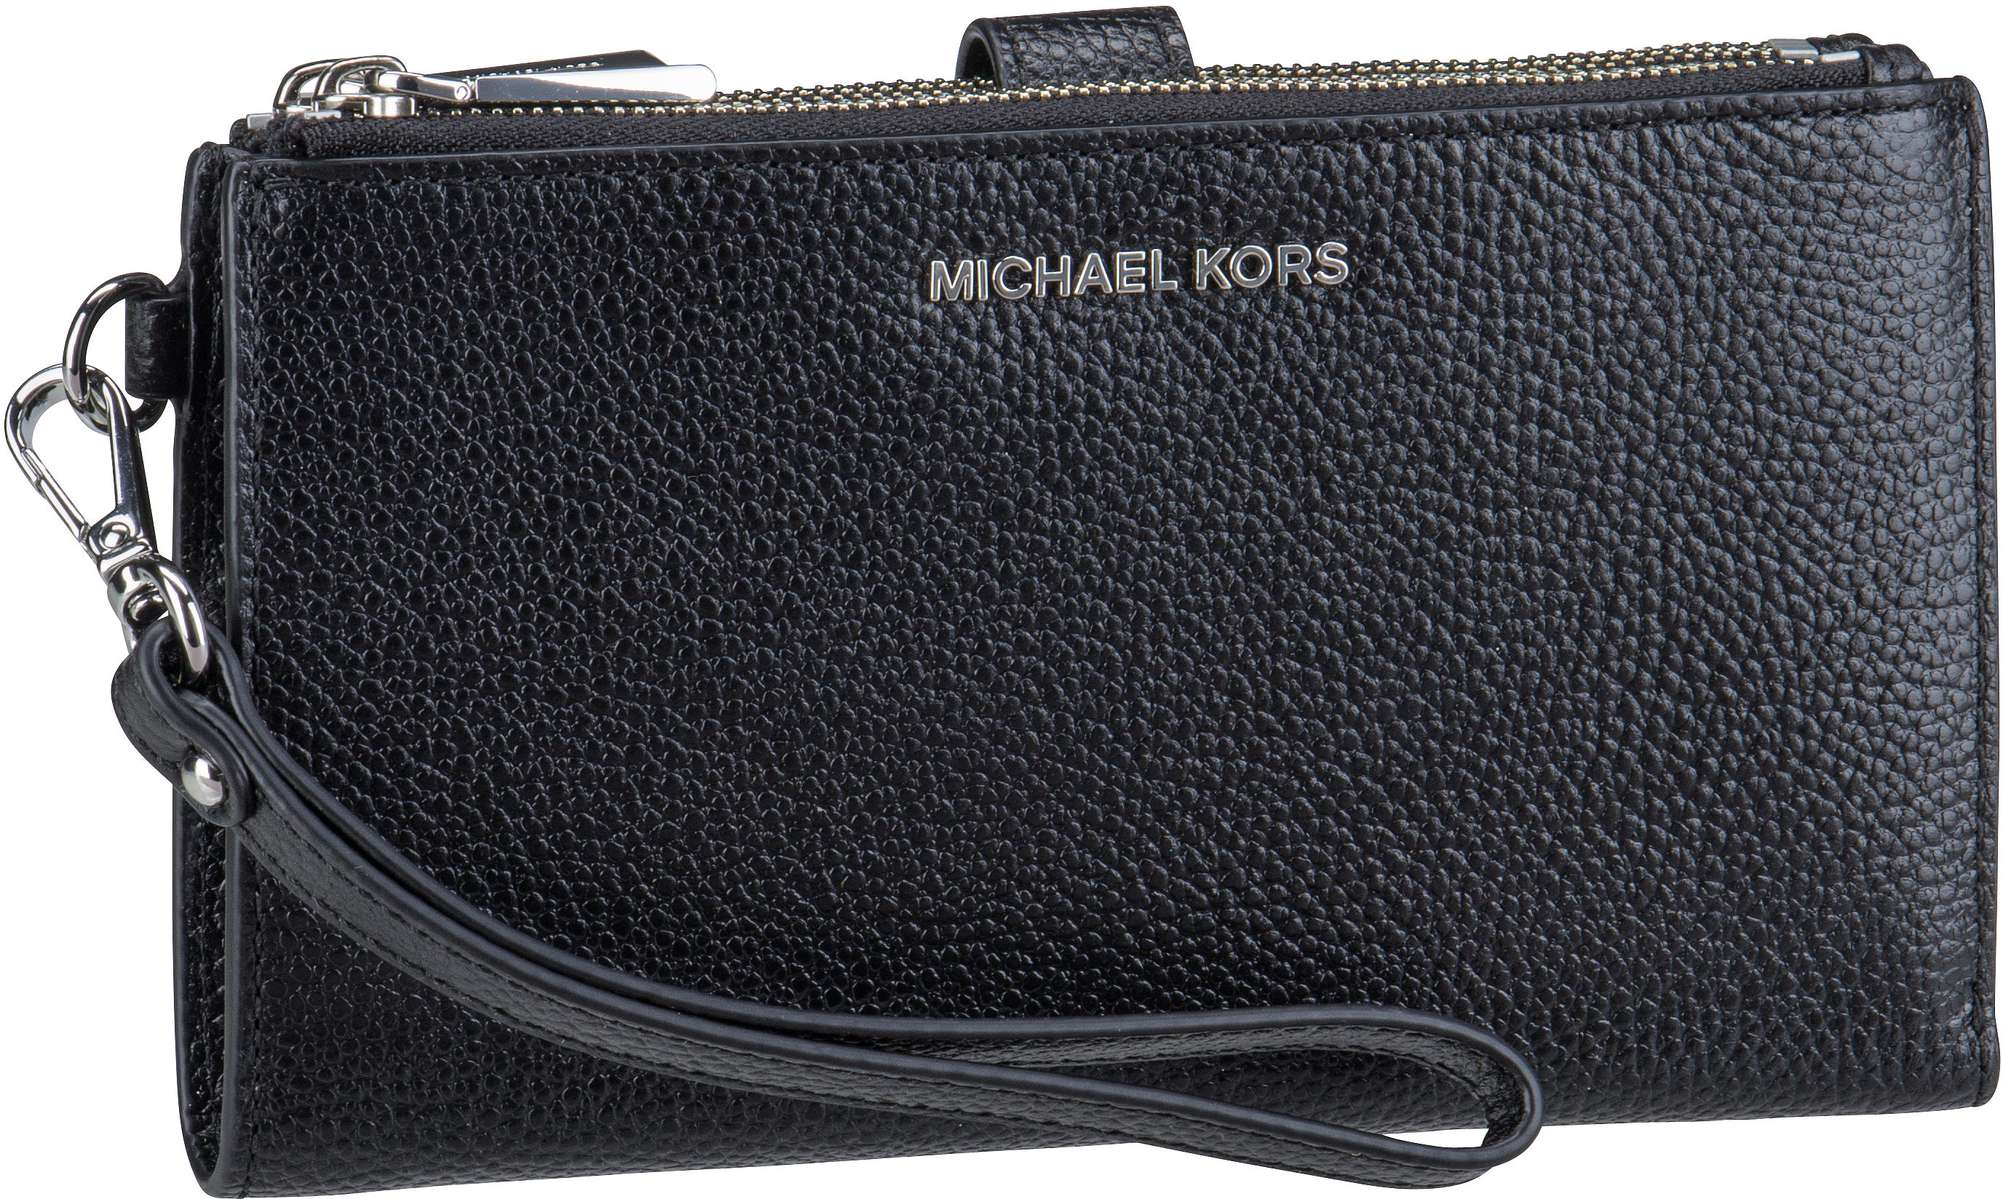 Michael Kors Handtasche Jet Set DoubleZip Wristlet Black